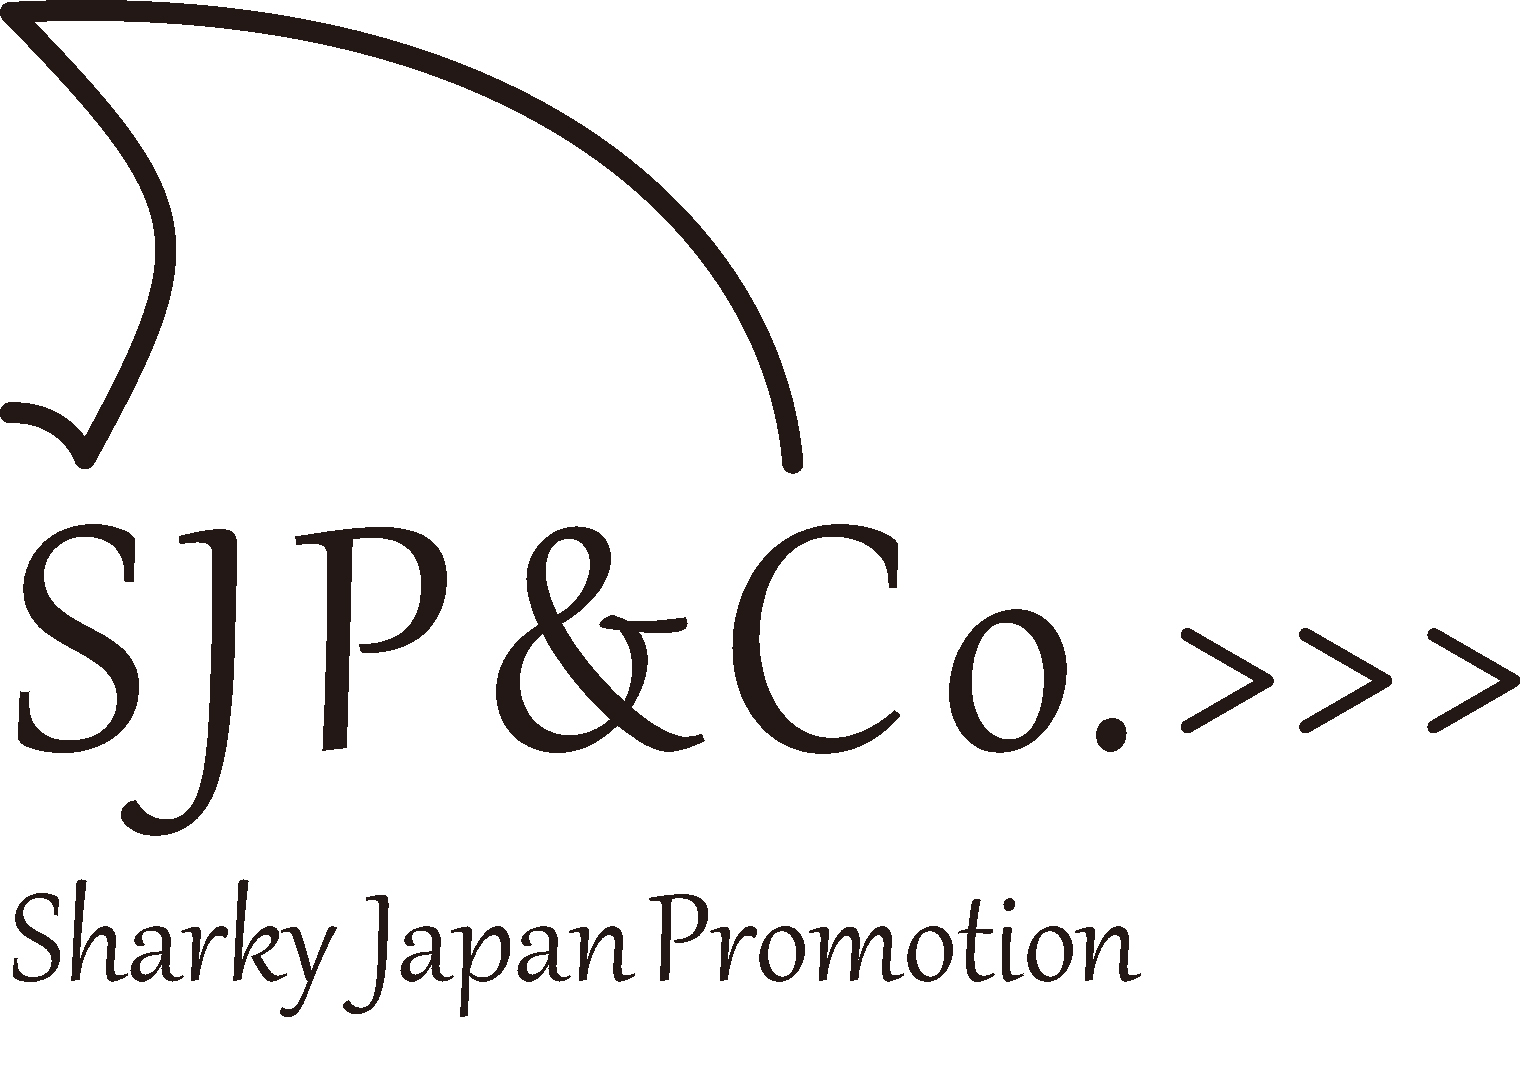 SJP株式会社  日本酒・焼酎・クラフトビール・ウィスキー・ワイン・小売販売・輸出・貿易・イベント企画・運営・製作会社